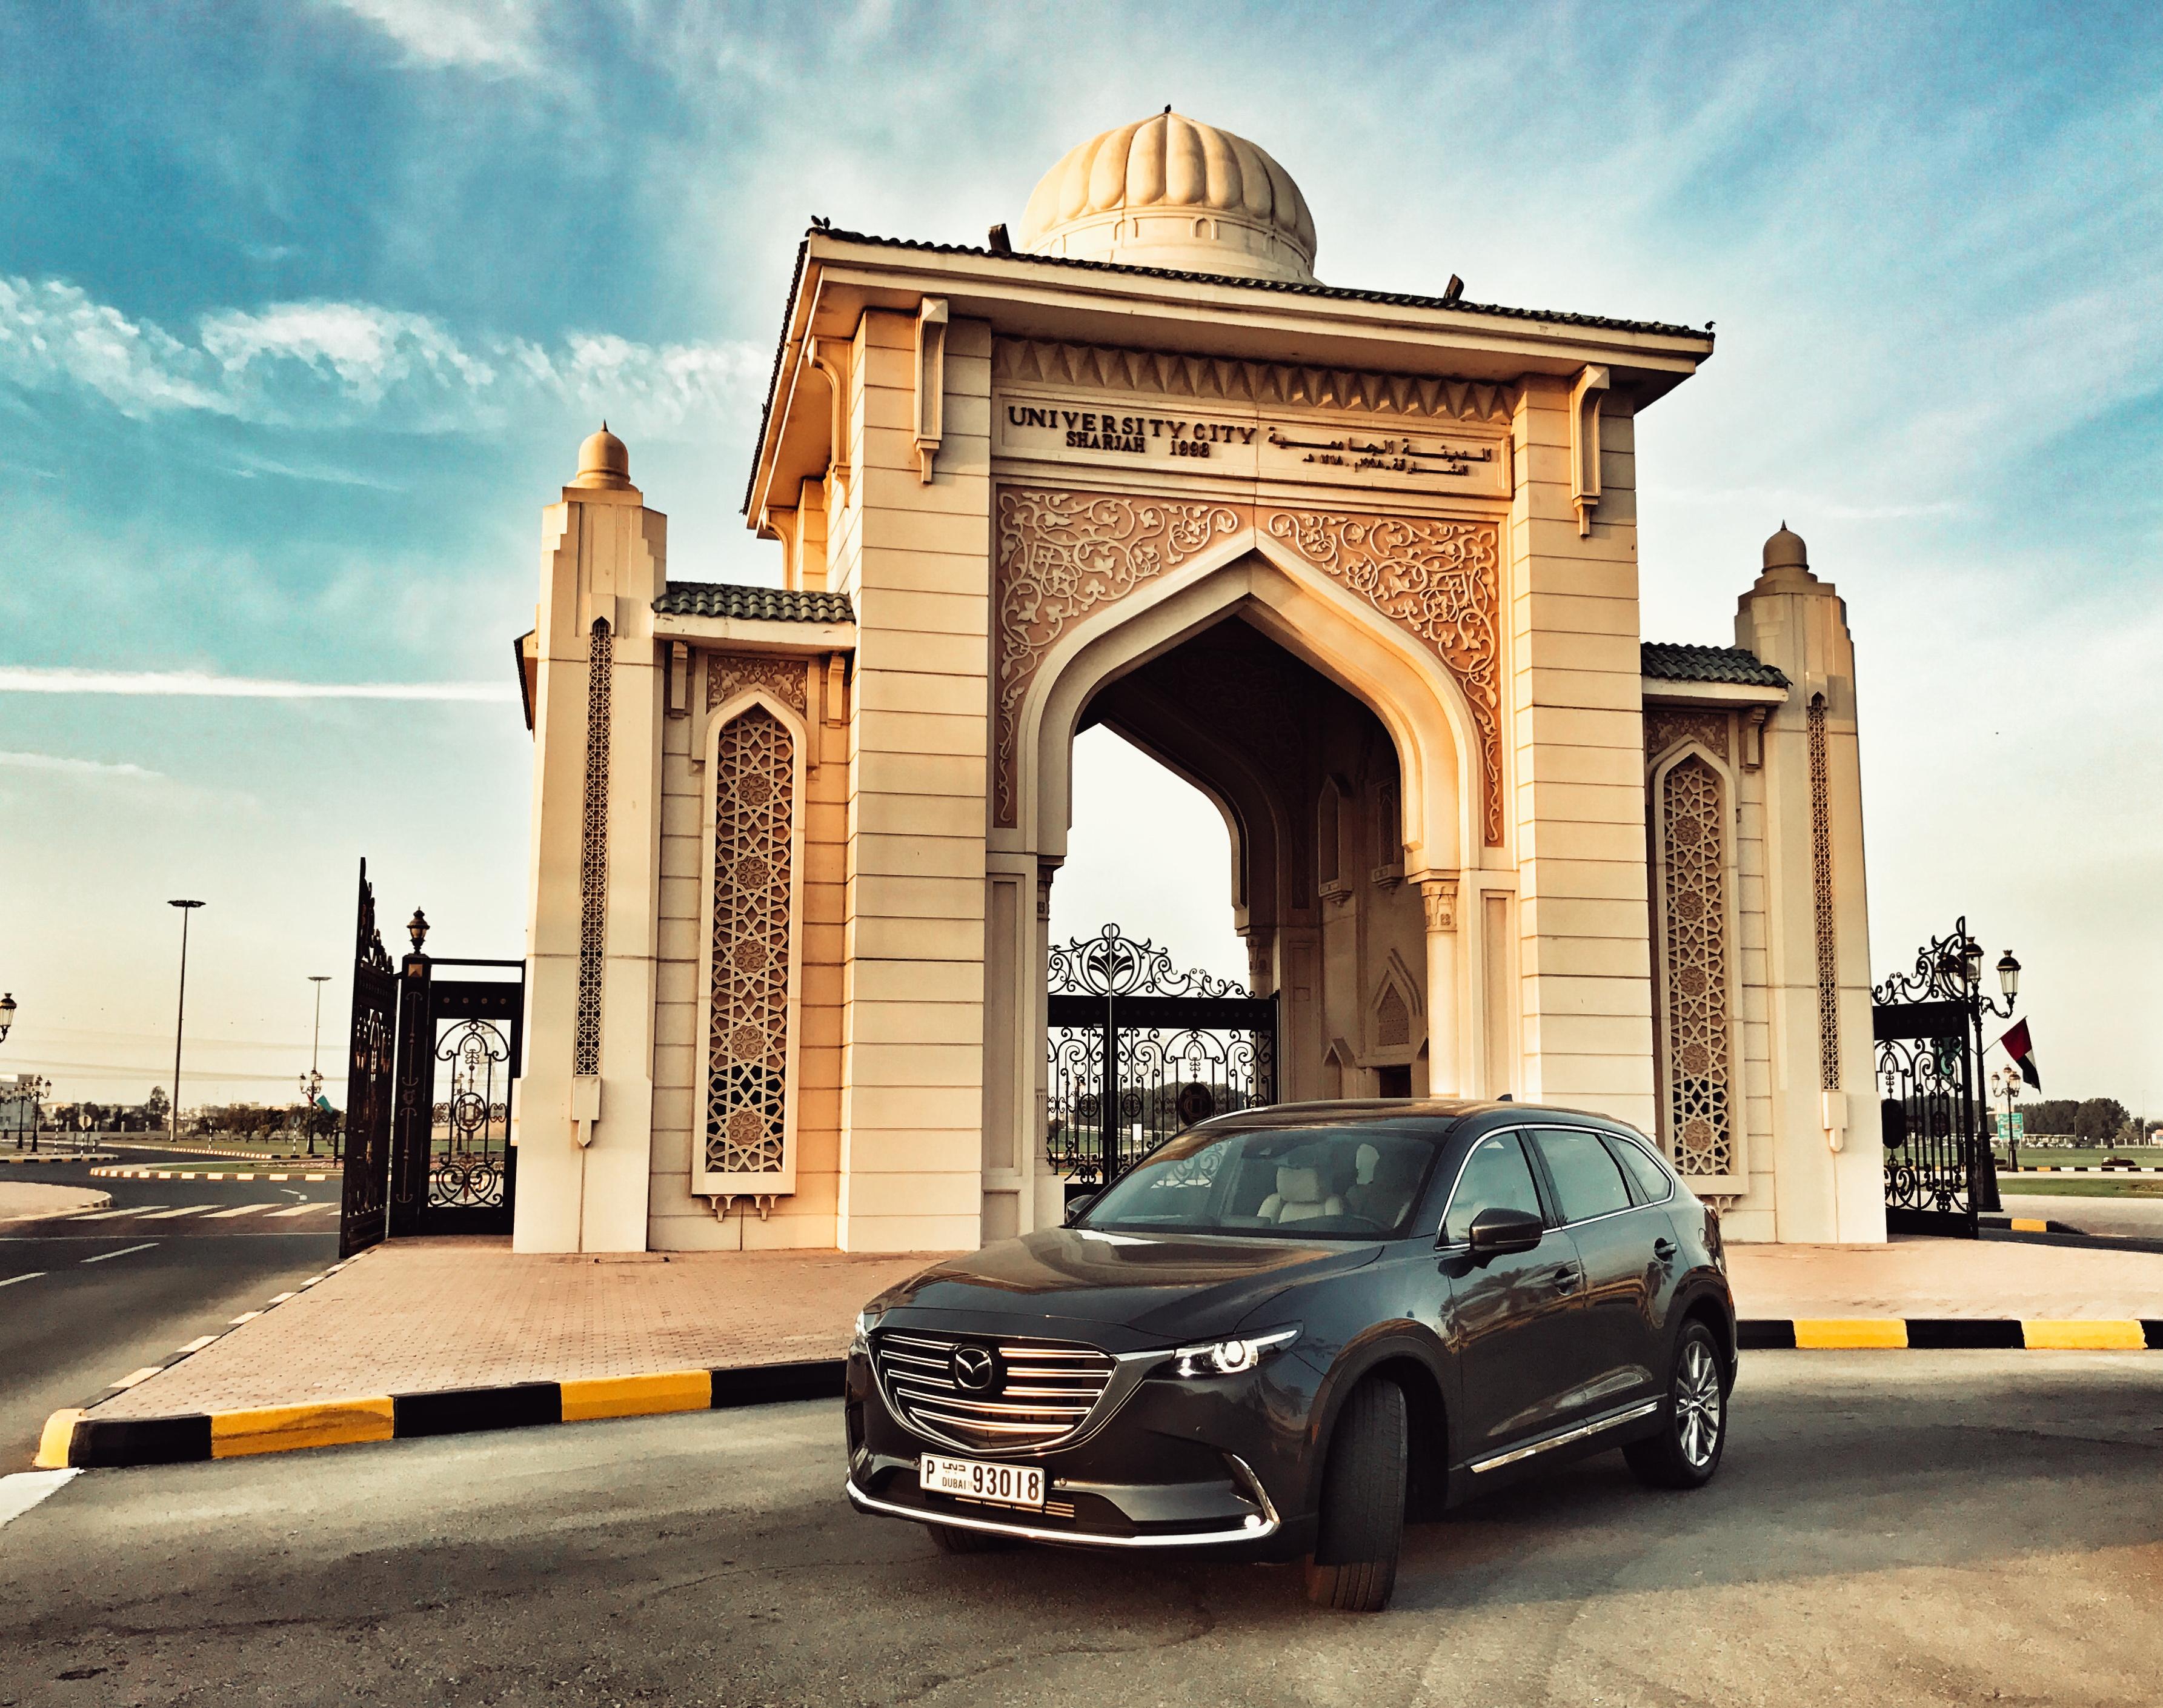 Mazda CX-9 Sharjah University City.jpg